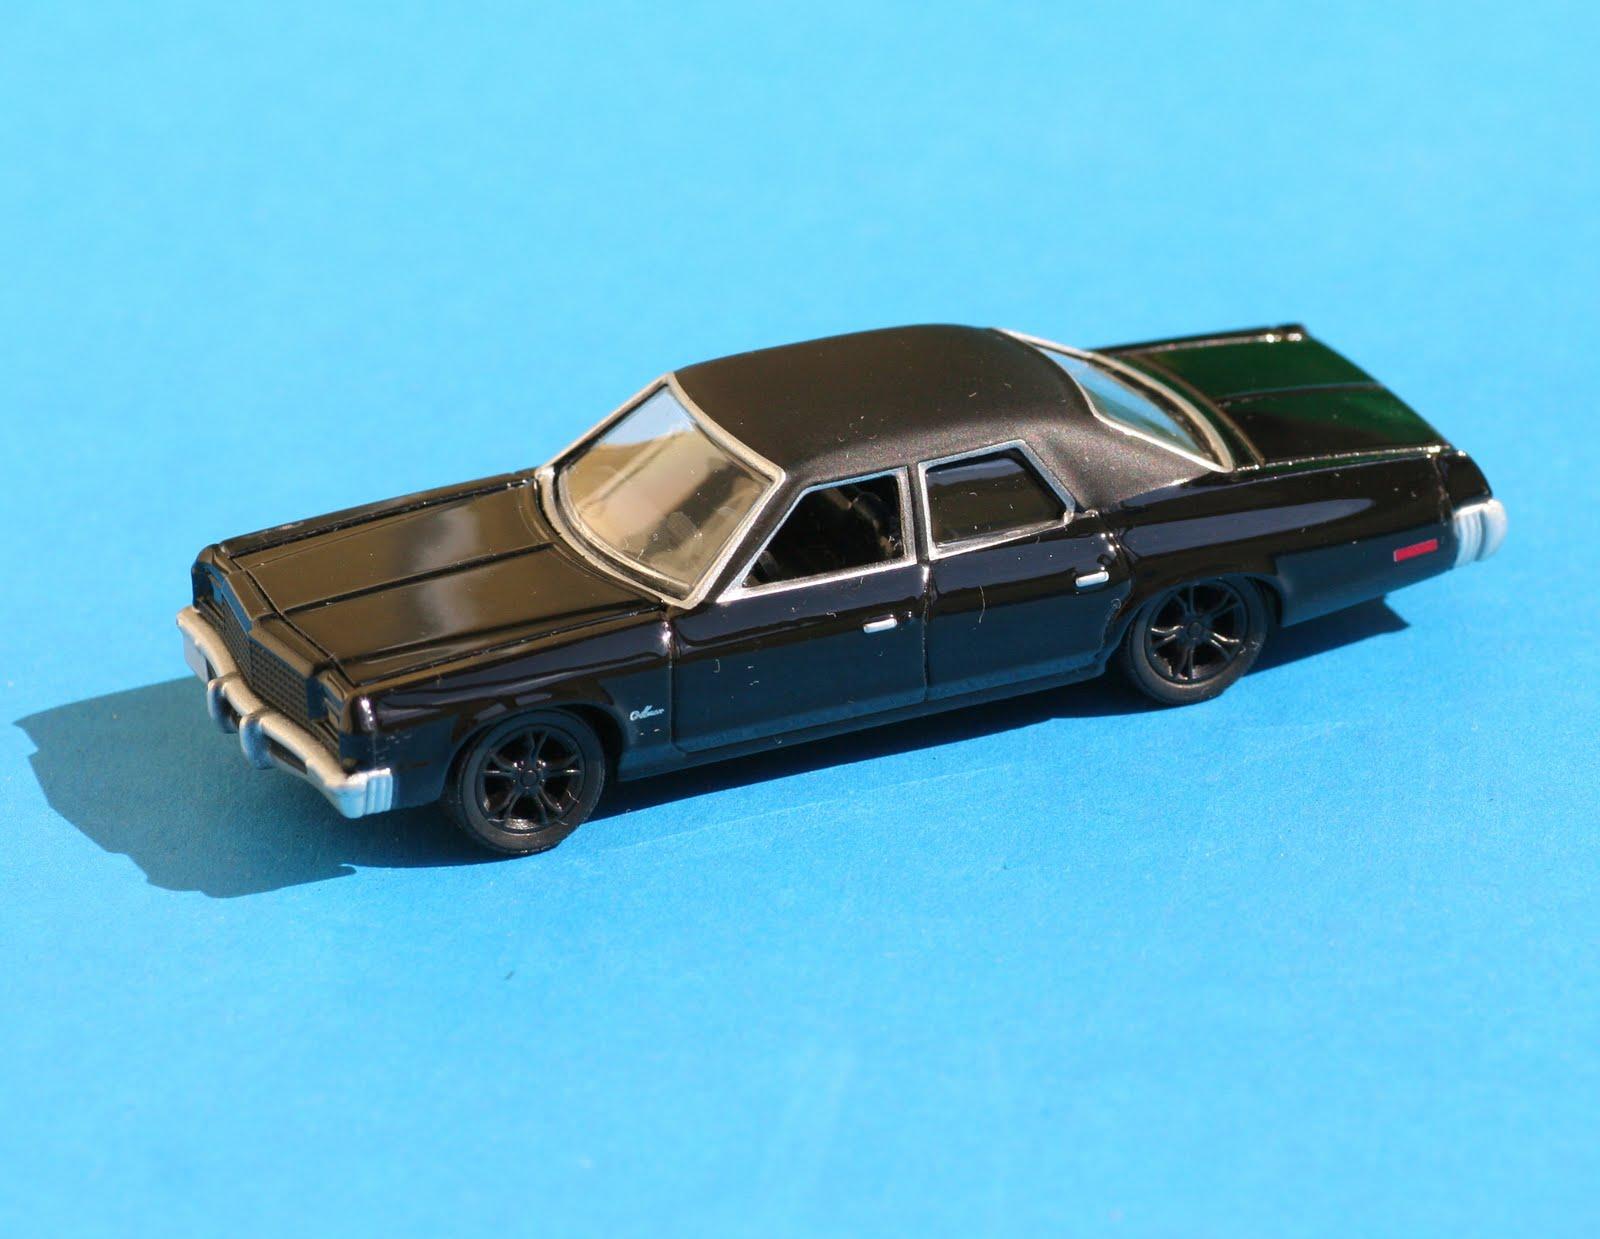 Incredible mini garage dodge royal monaco 1977 greenlight for Garage mini monaco